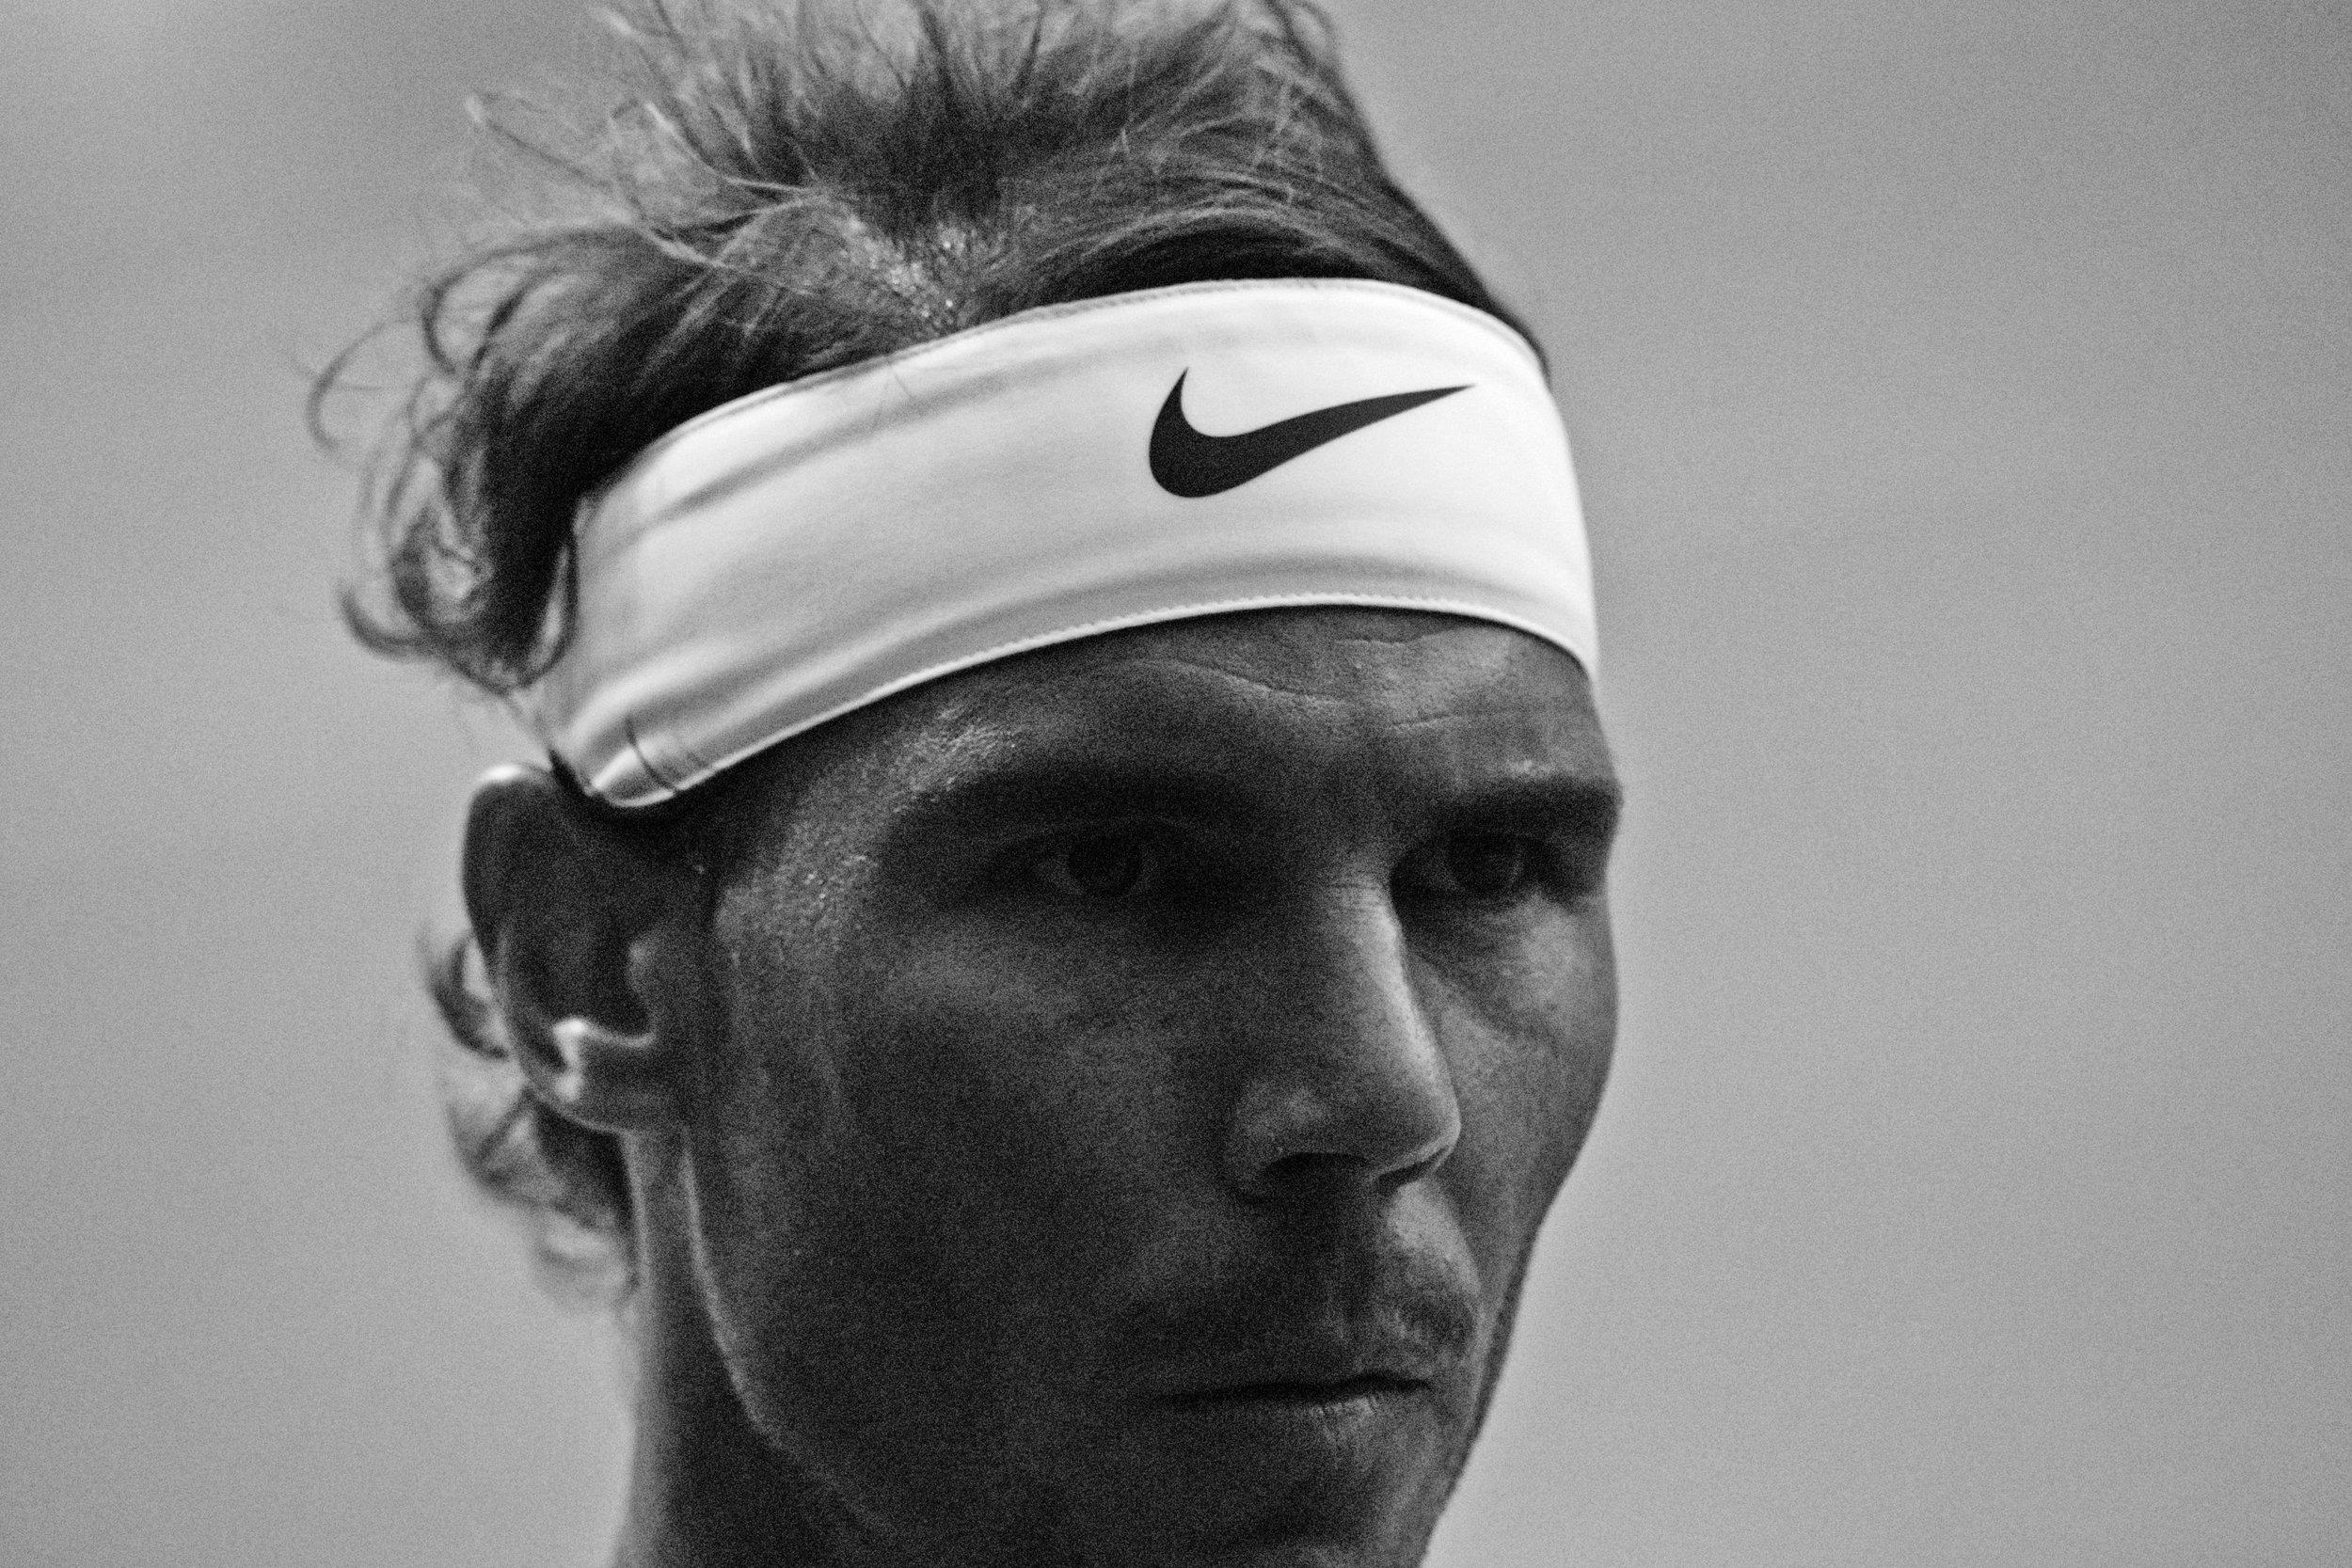 Wimbledon_New_York_Times_Stockdale20.jpg